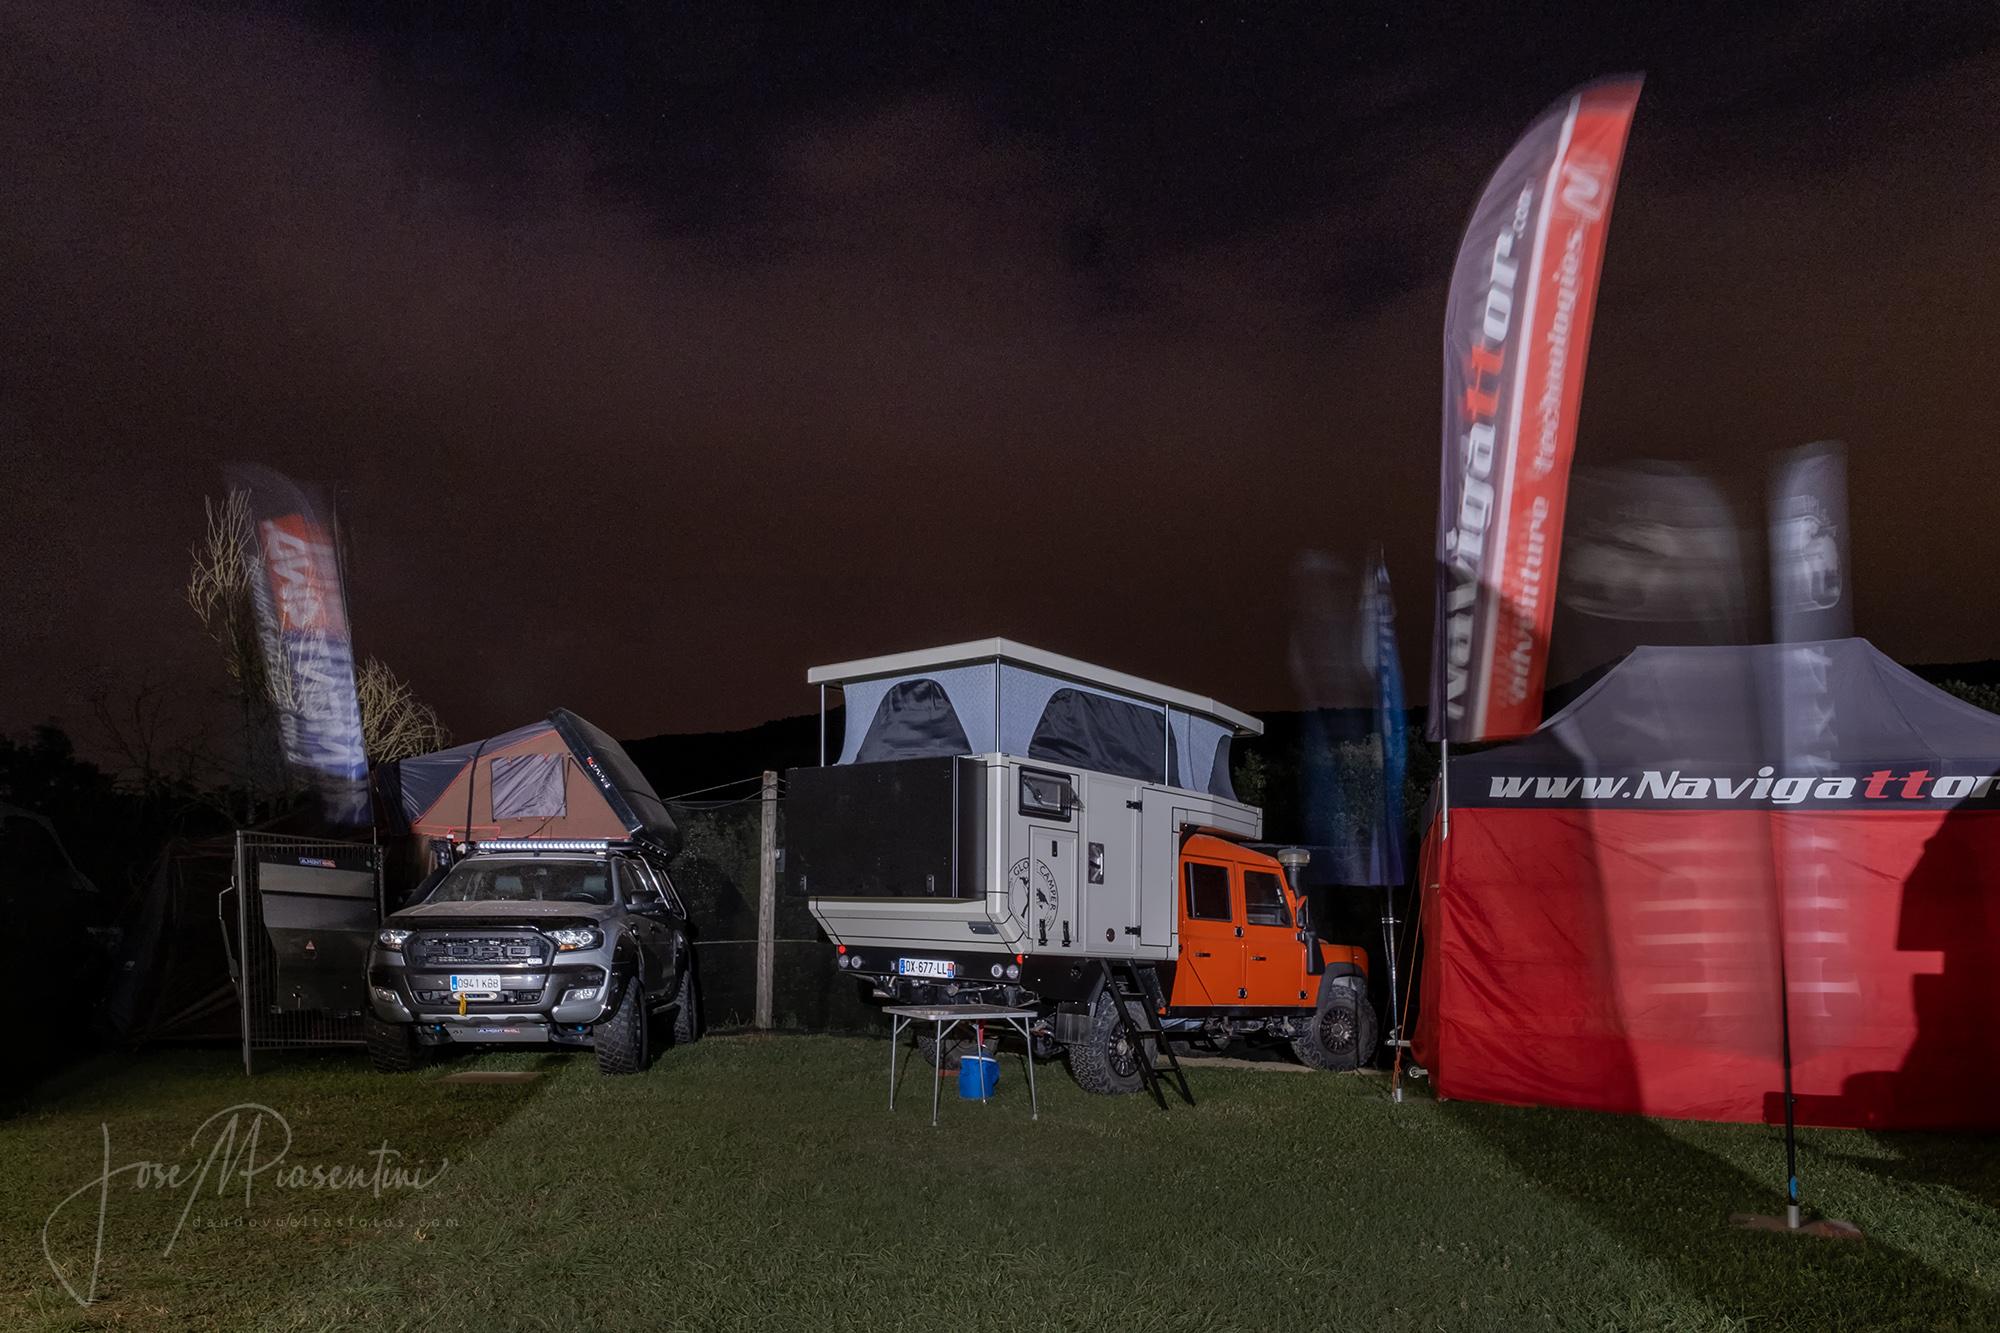 Globe Camper y Navigattor